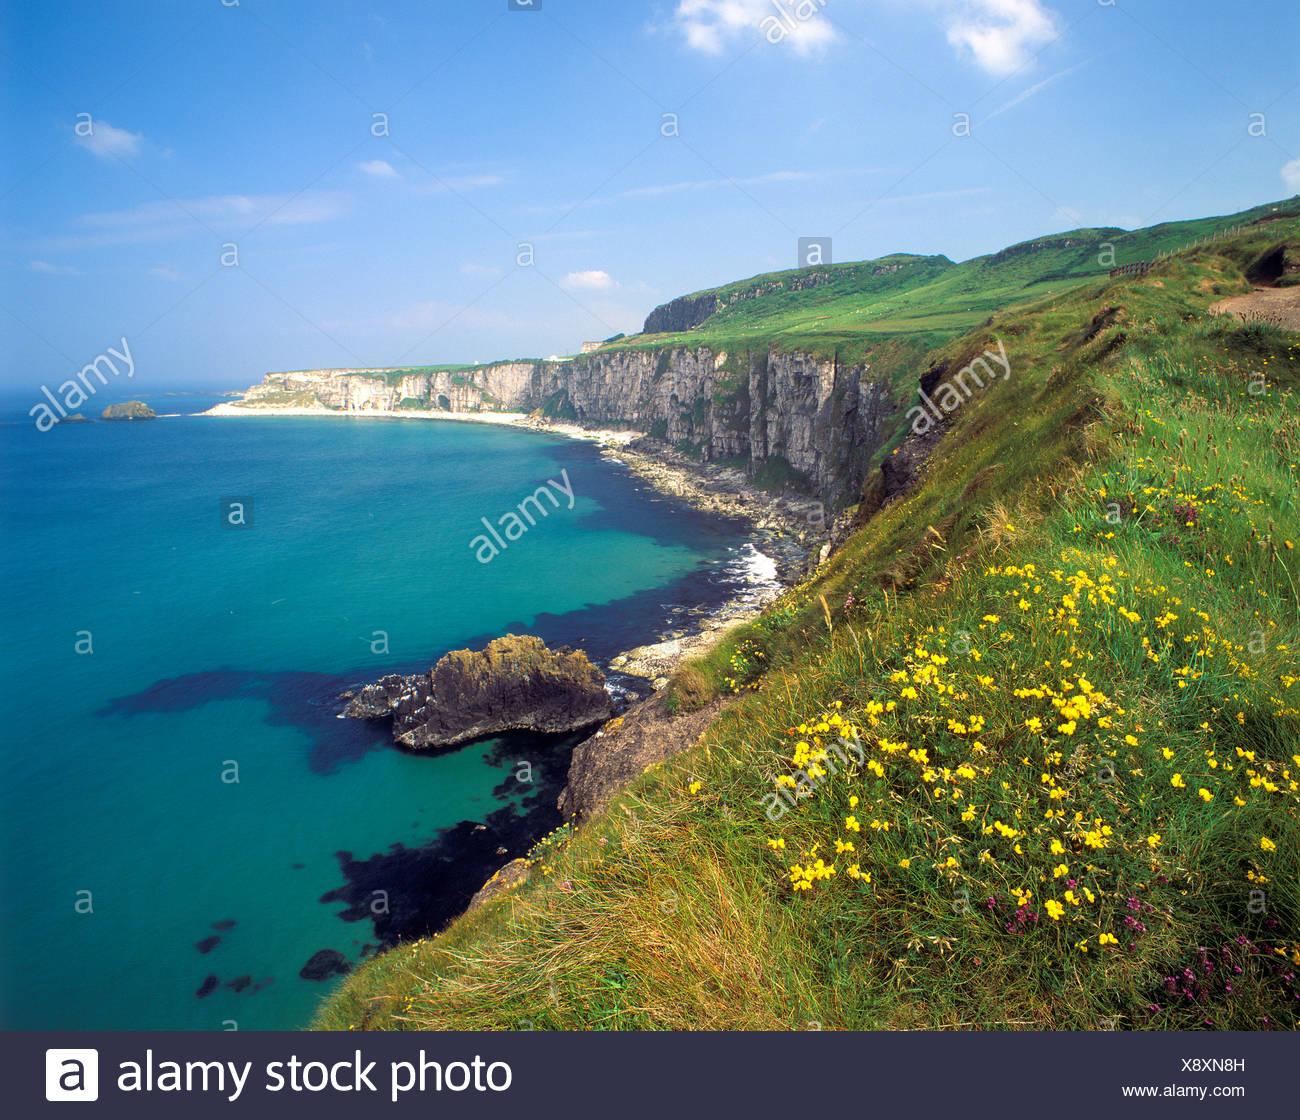 Coastline at Carrick a Rede, County Antrim, Northern Ireland, United Kingdom, Europe - Stock Image